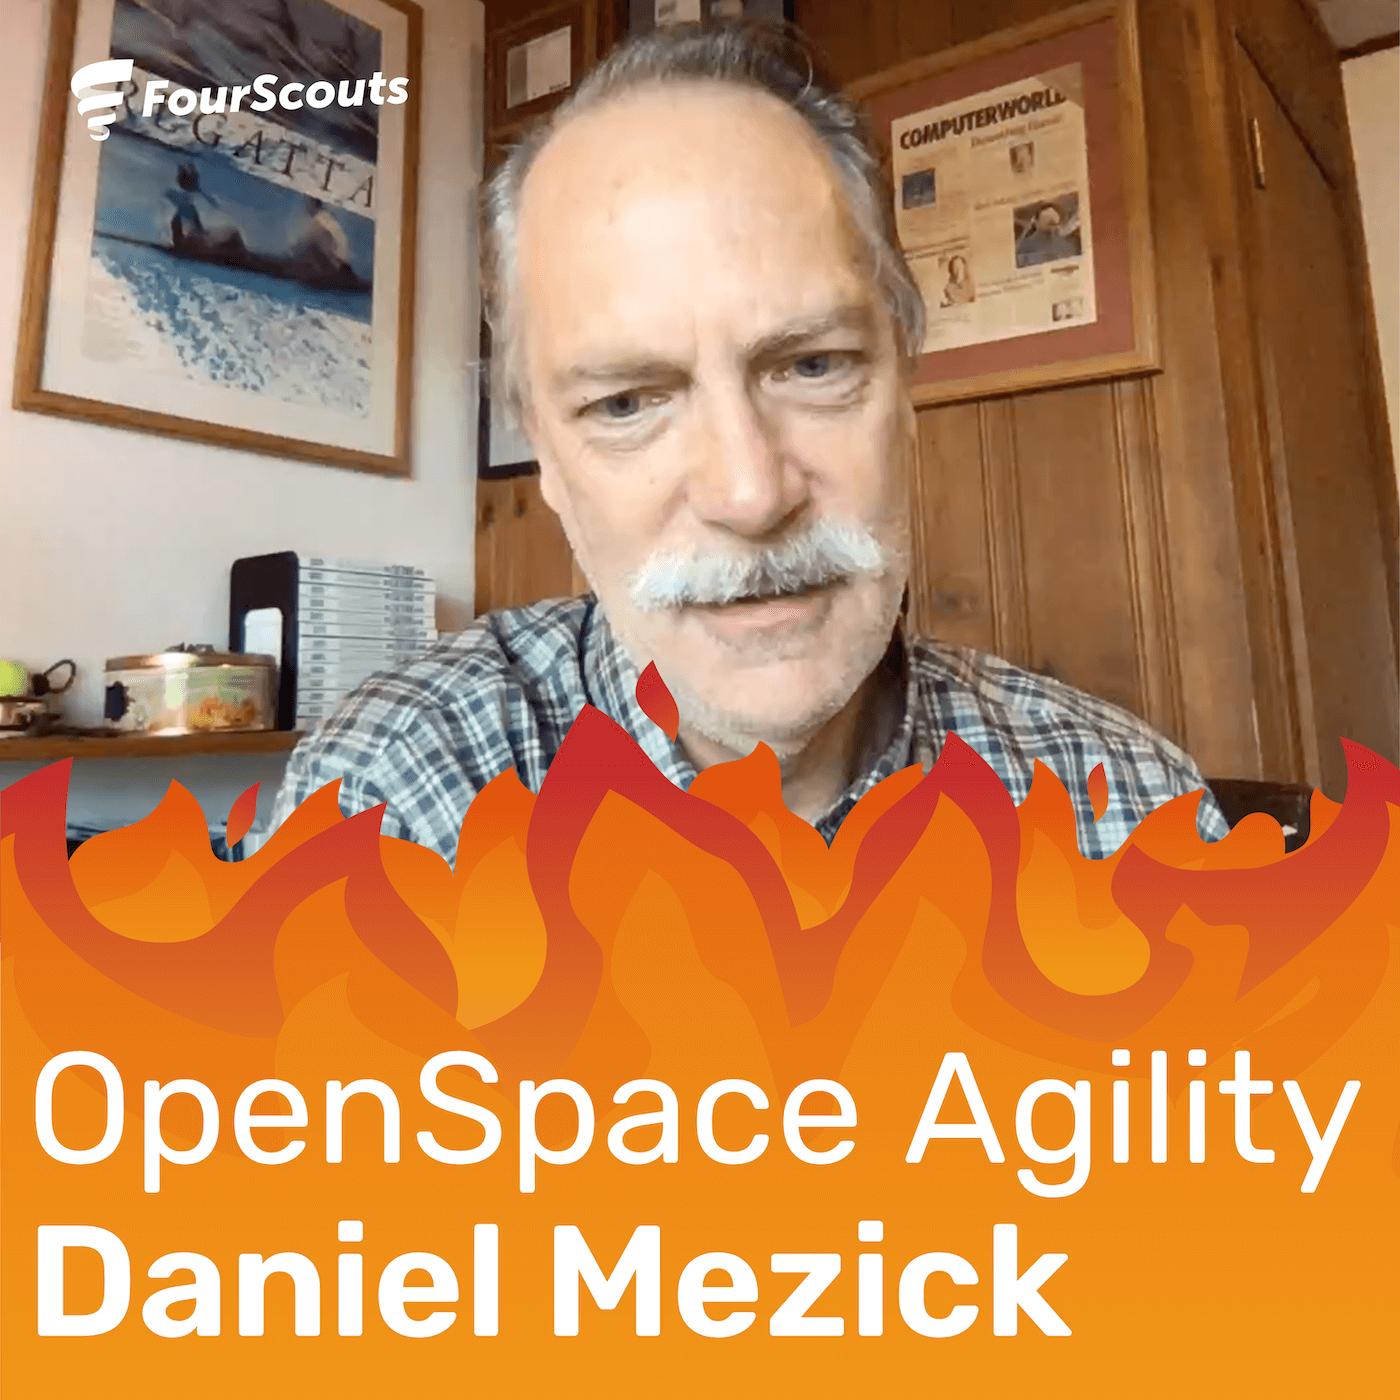 OpenSpace Agility with Daniel Mezick